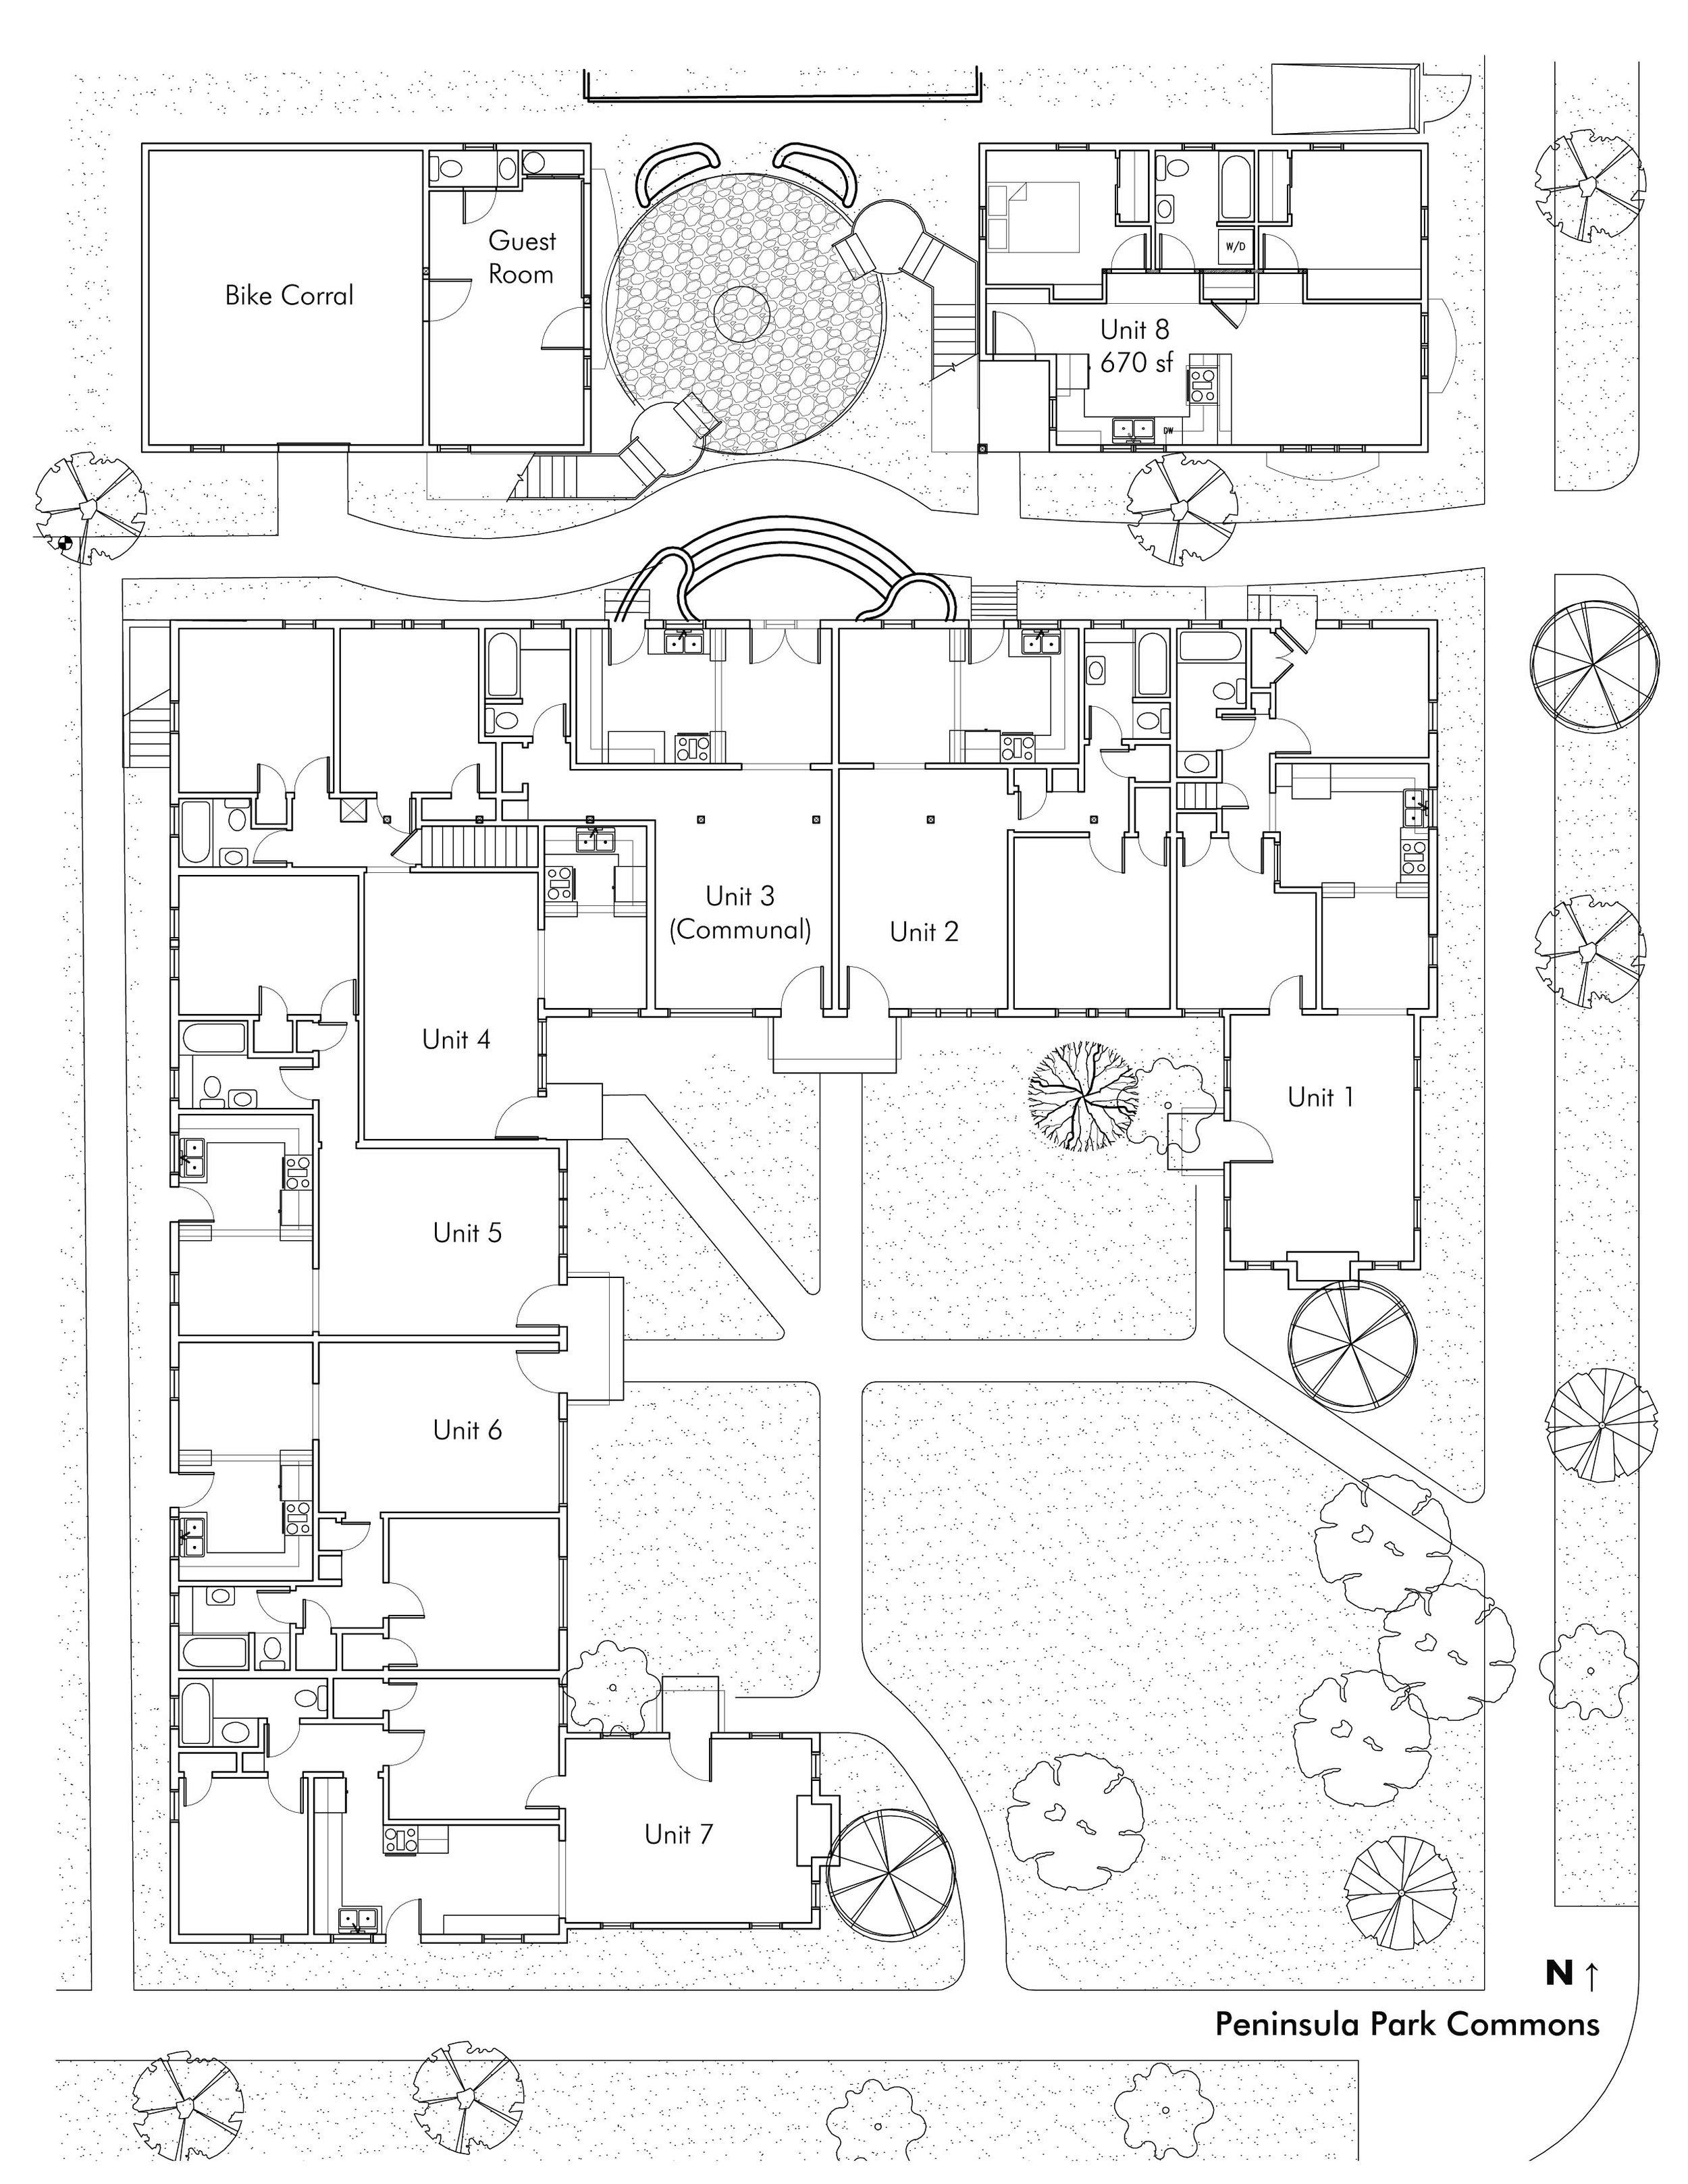 Harka Architecture_Peninsula Park Commons (19).jpg